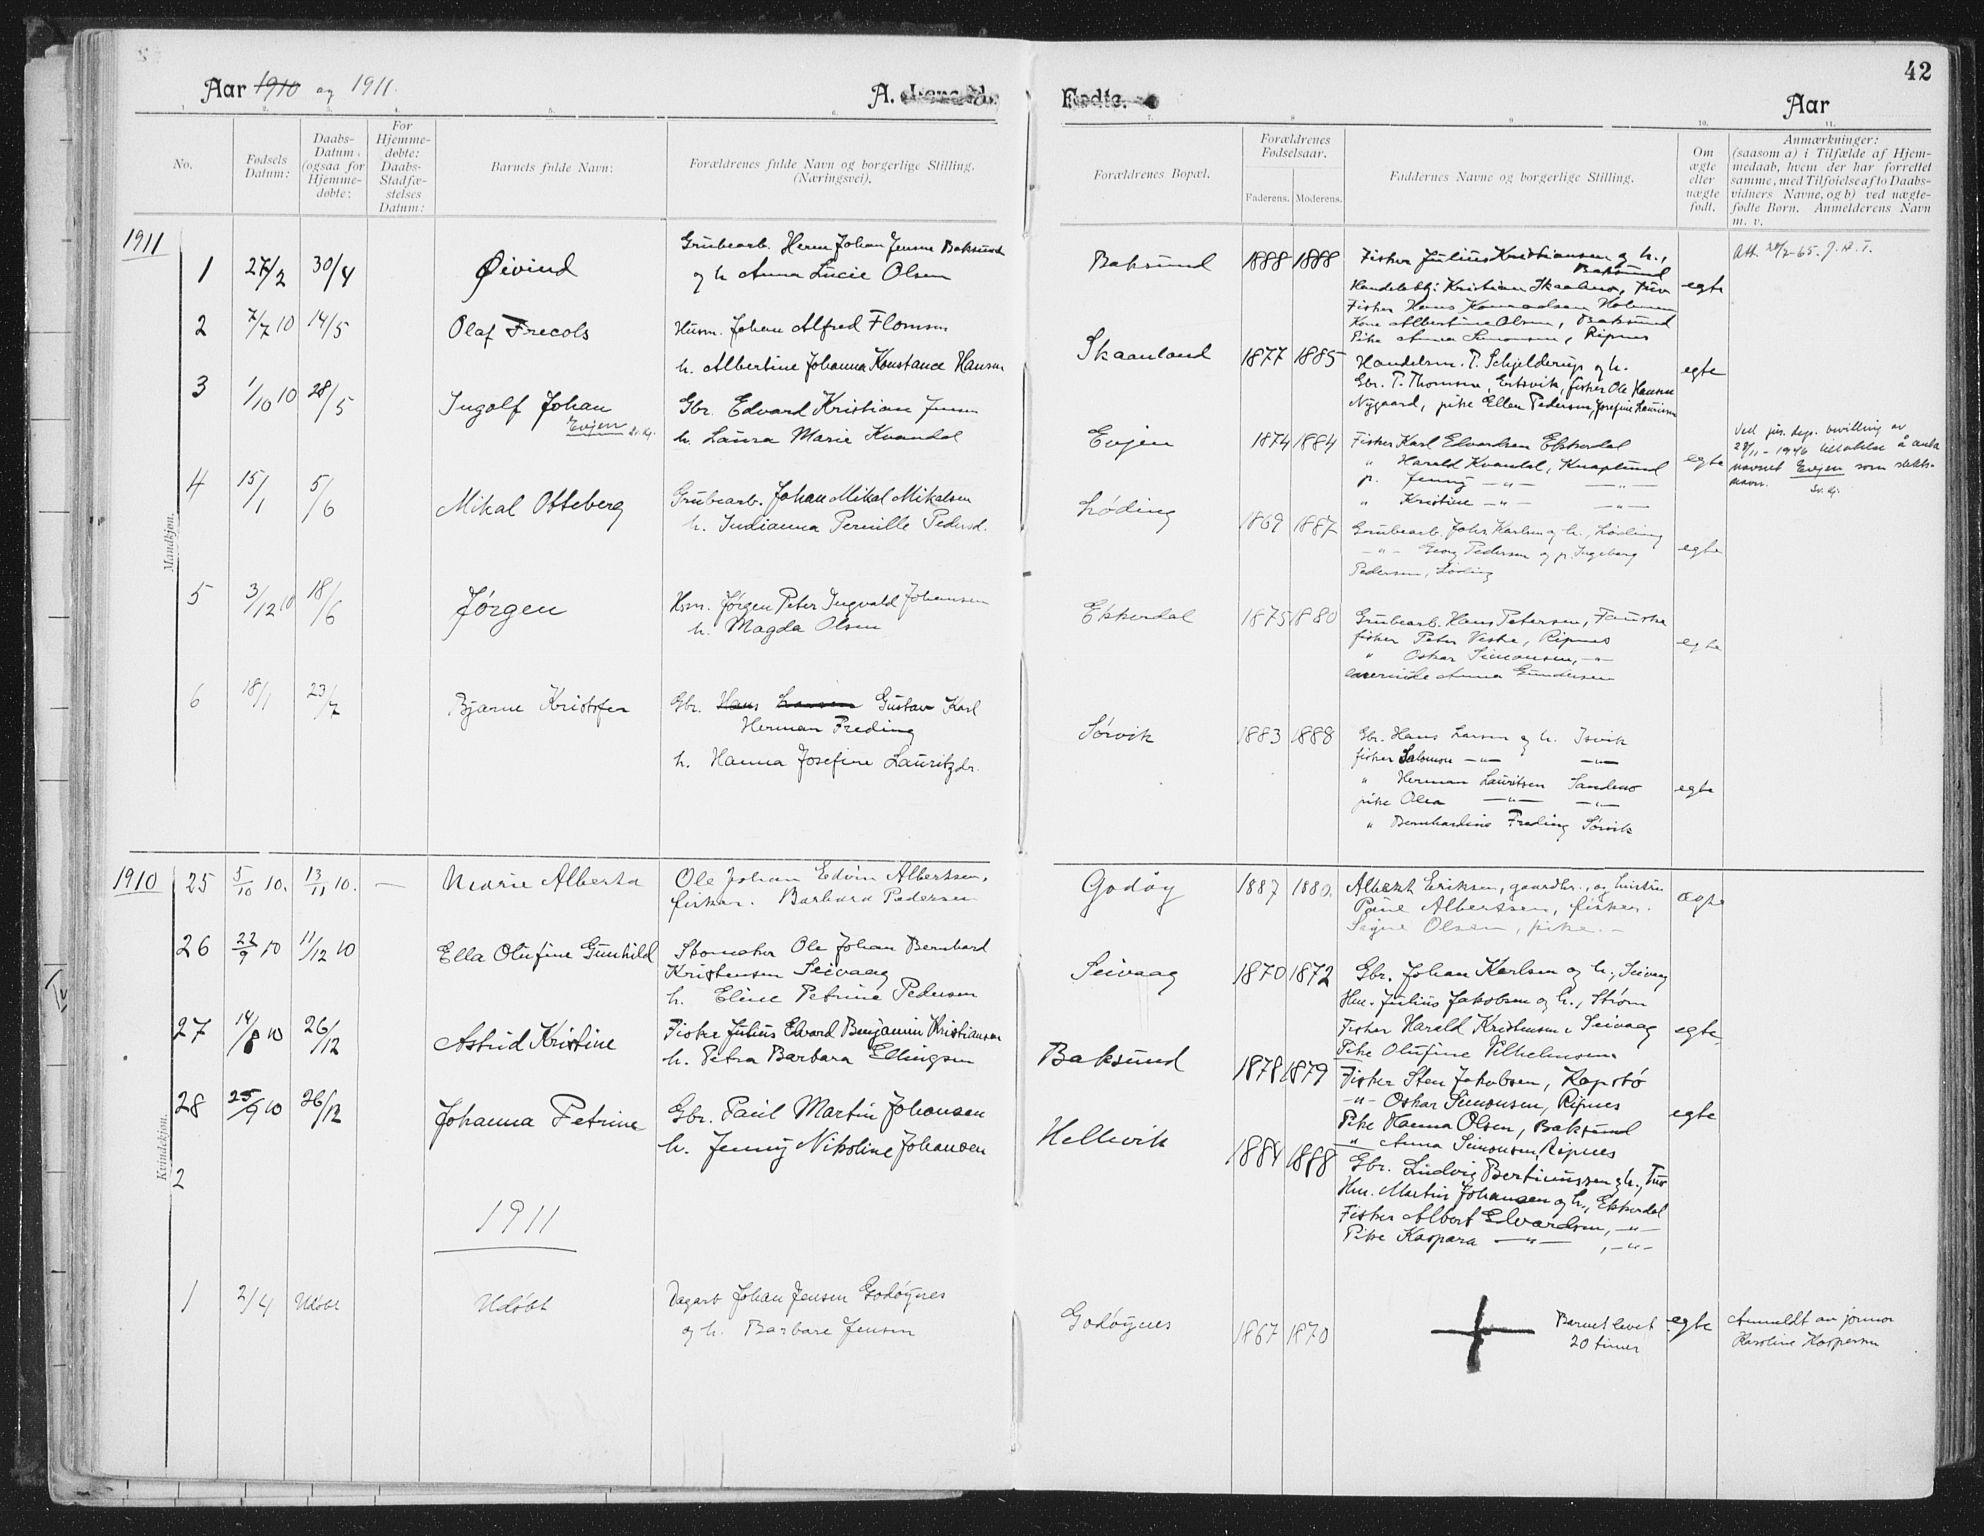 SAT, Ministerialprotokoller, klokkerbøker og fødselsregistre - Nordland, 804/L0081: Ministerialbok nr. 804A02, 1901-1915, s. 42